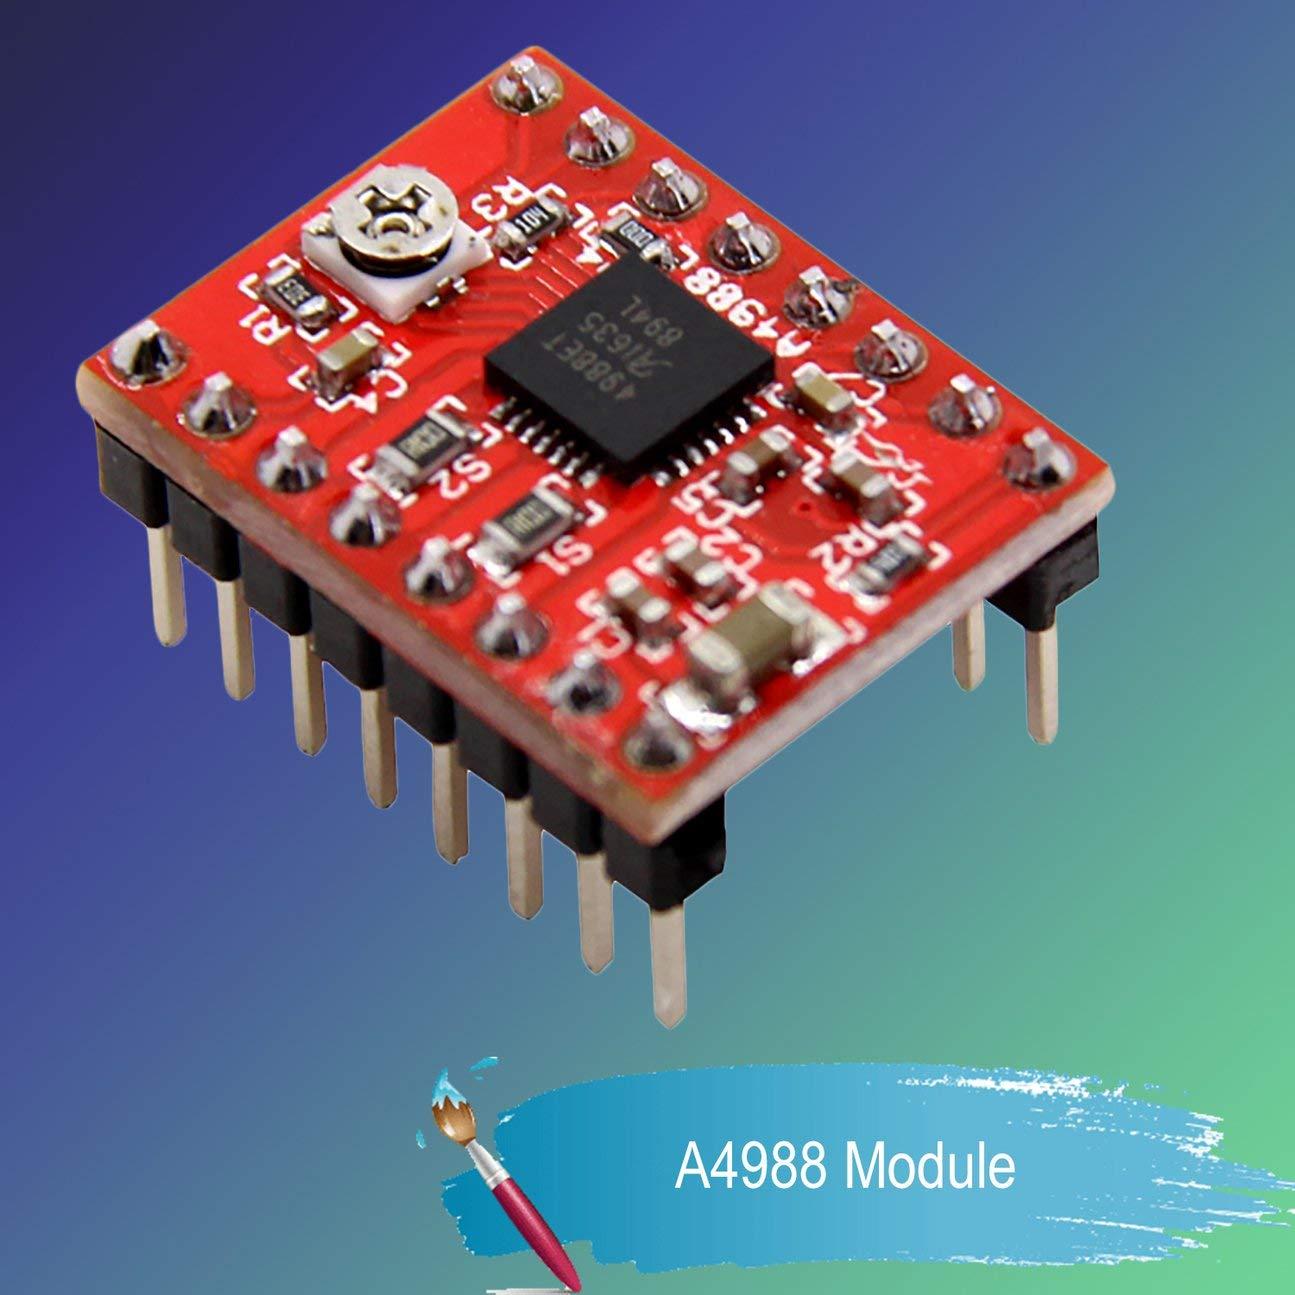 A4988 Breakout Shield Board Controlador del m/ódulo de control del controlador del motor paso a paso con disipador t/érmico Reprap 3D Printer Parts para Arduino